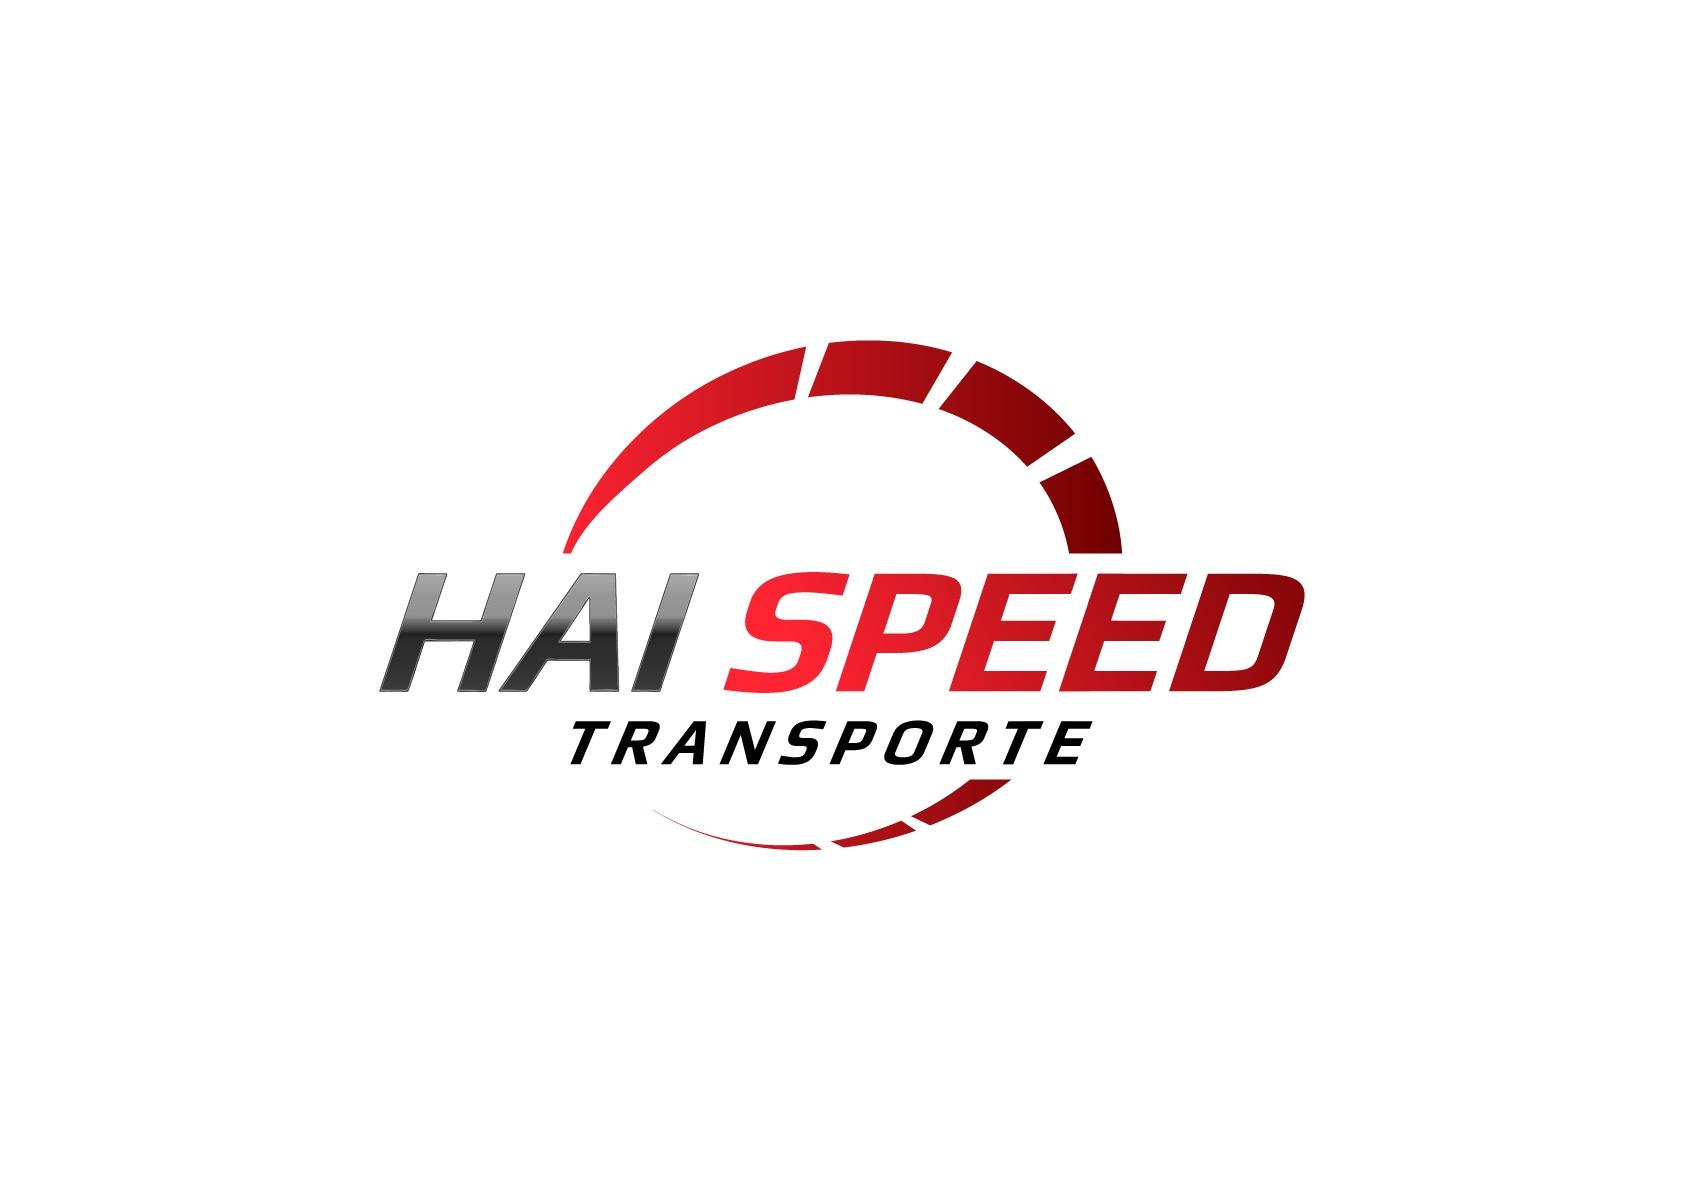 HAI Speed Transporte